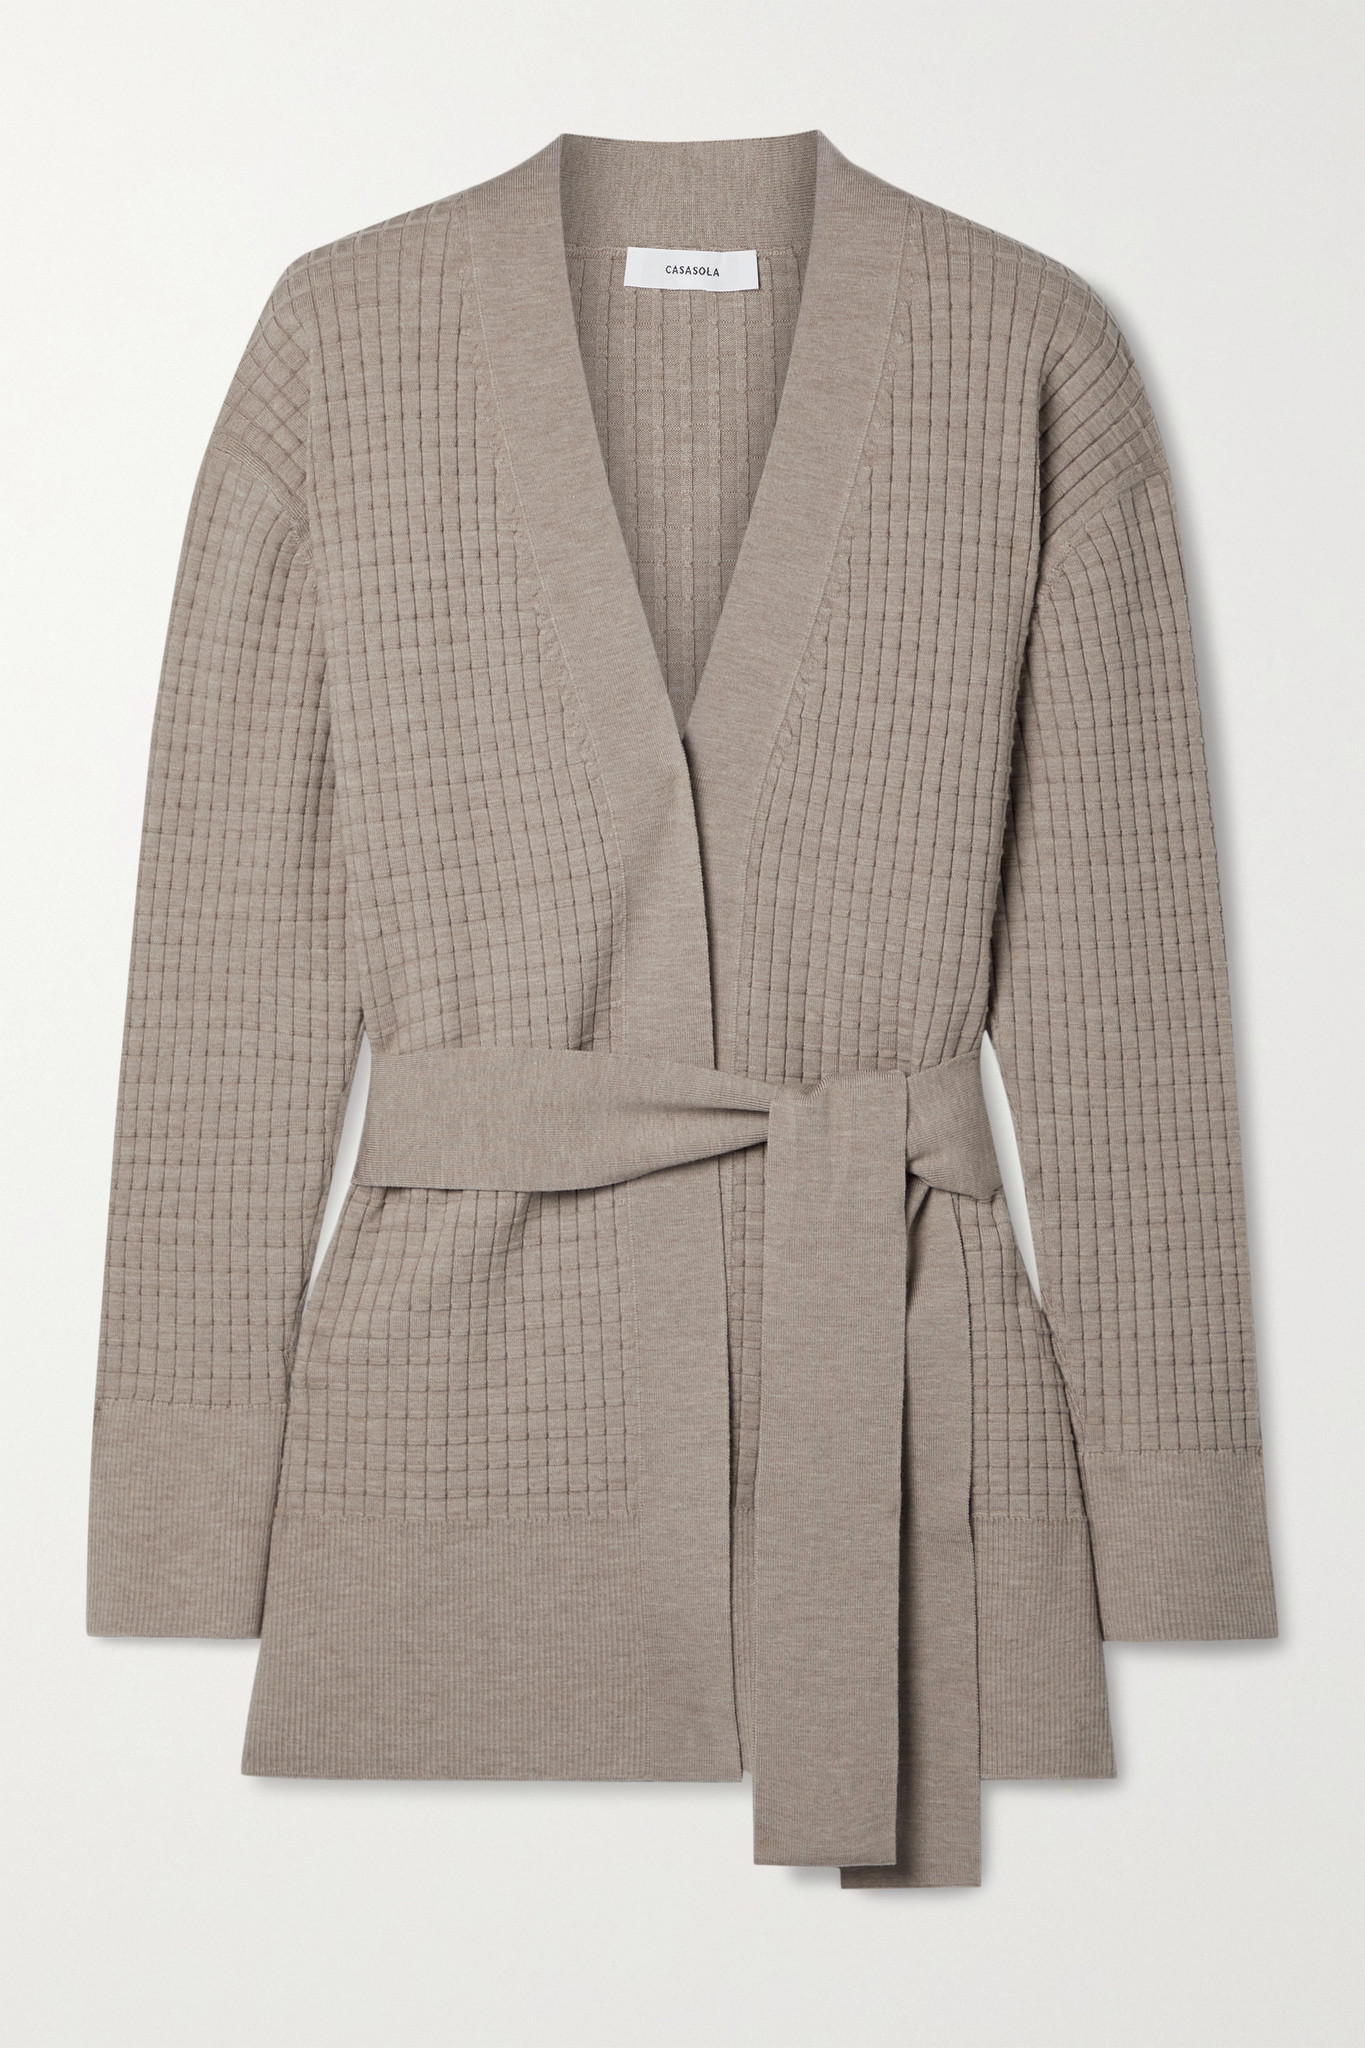 CASASOLA - Como Belted Waffe-knit Wool-blend Cardigan - Neutrals - IT36